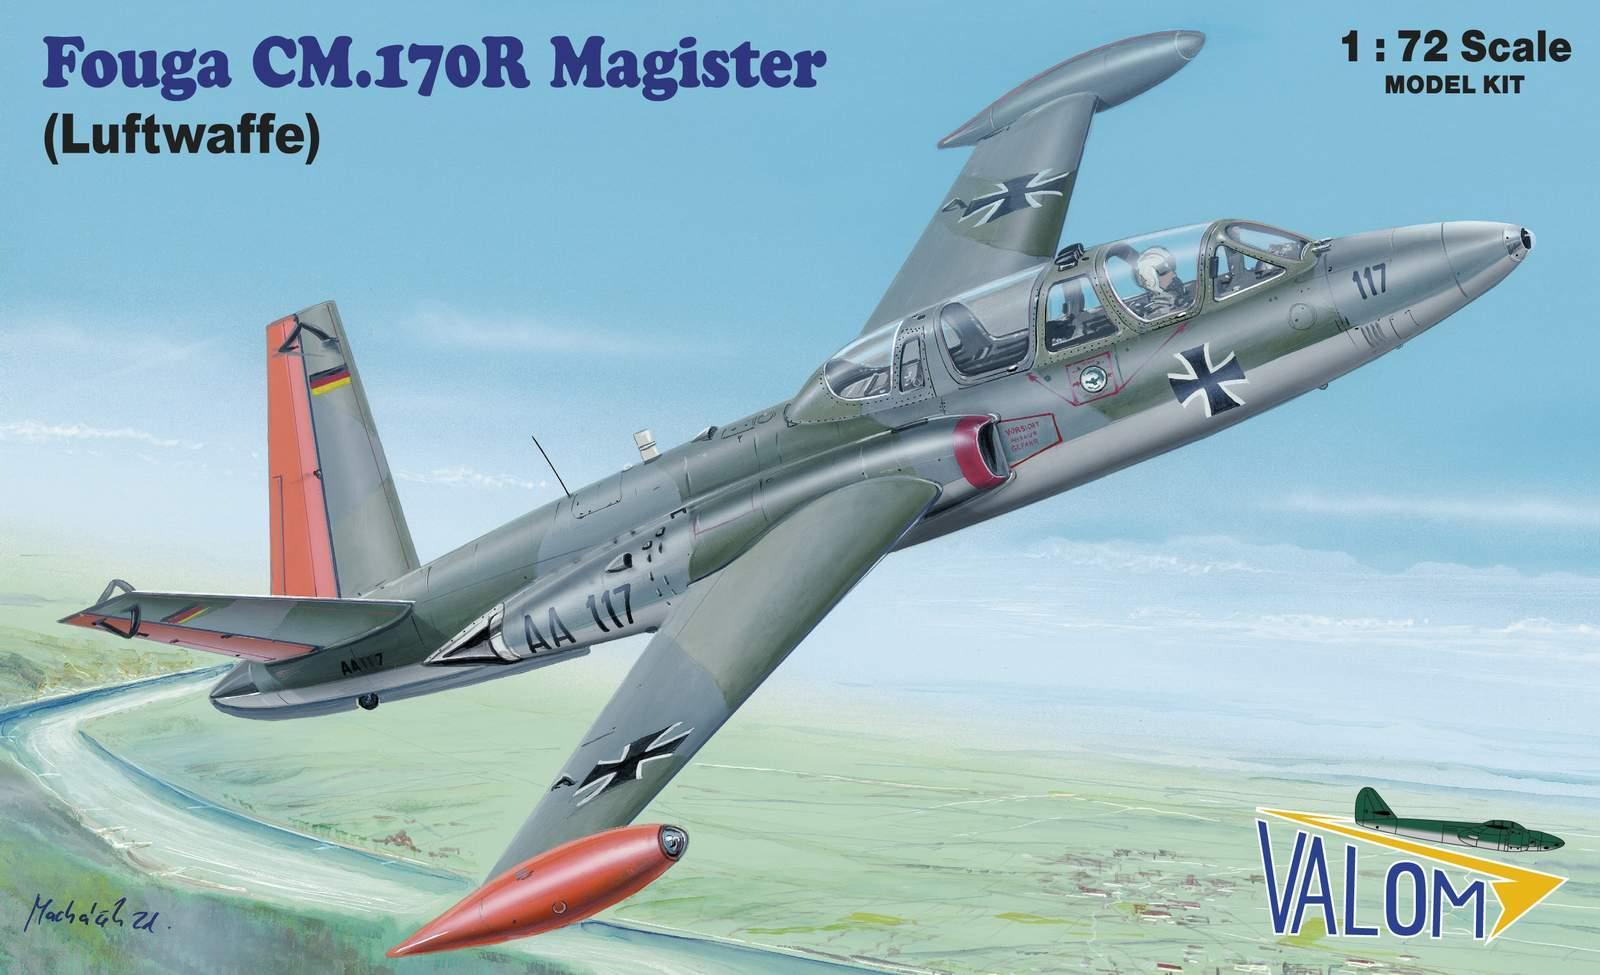 Valom Fouga CM.170R Magister (Luftwaffe)